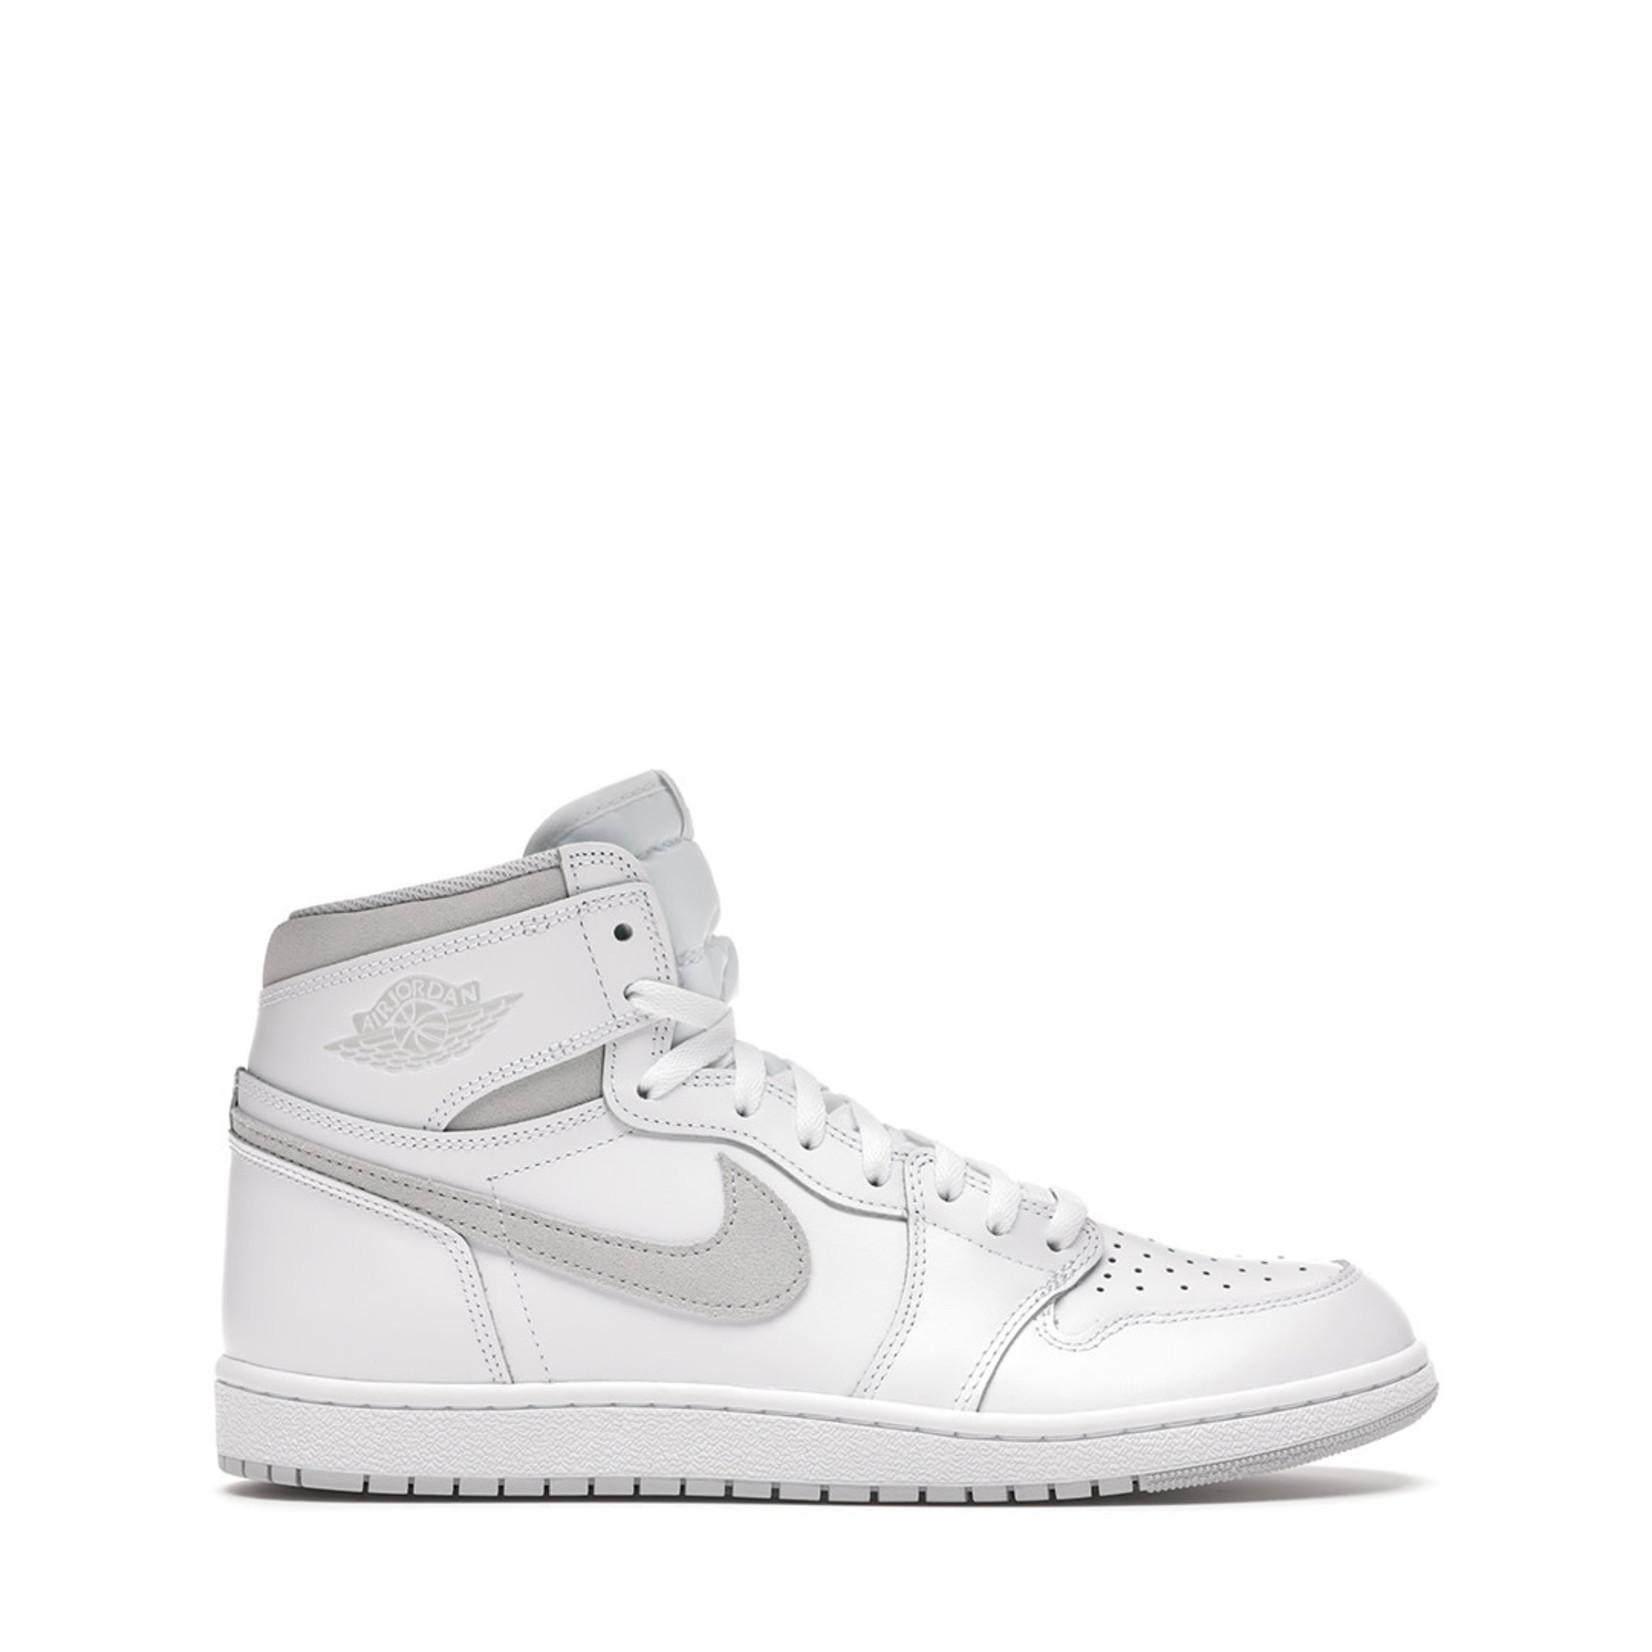 Jordan Jordan 1 Retro High 85 Neutral Grey